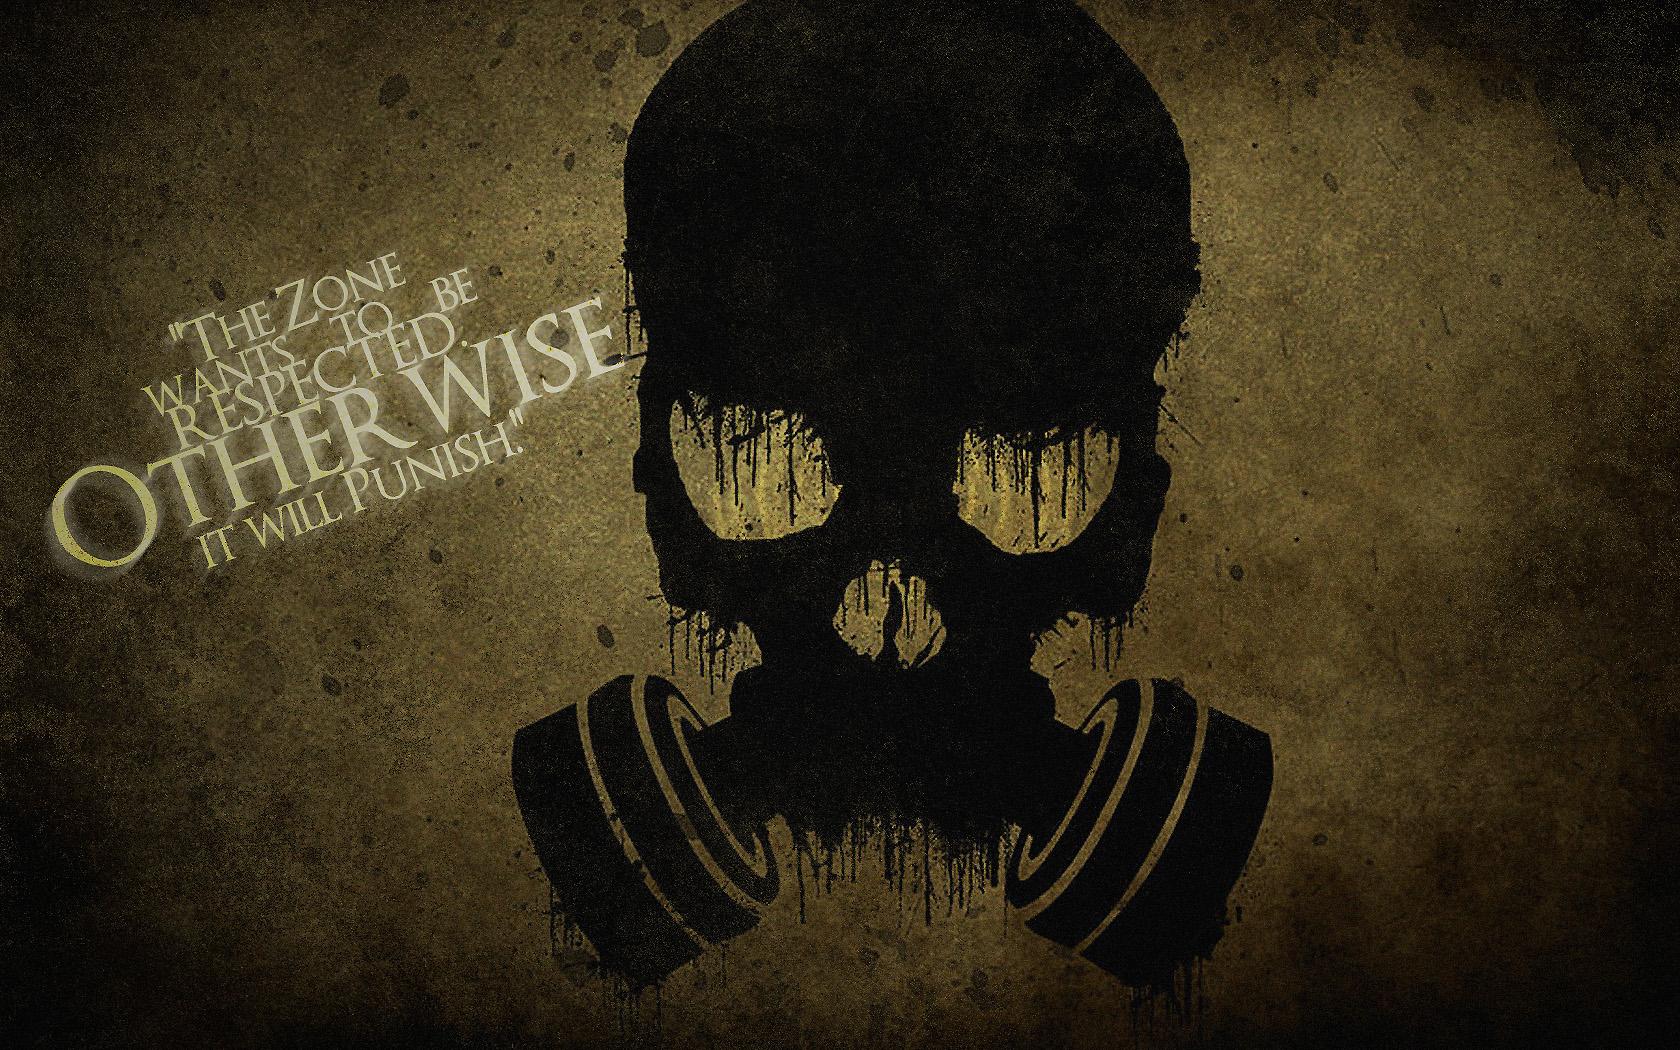 V For Vendetta Quotes Iphone Wallpaper Http Greatjester Deviantart Com Art Gas Mask Skull